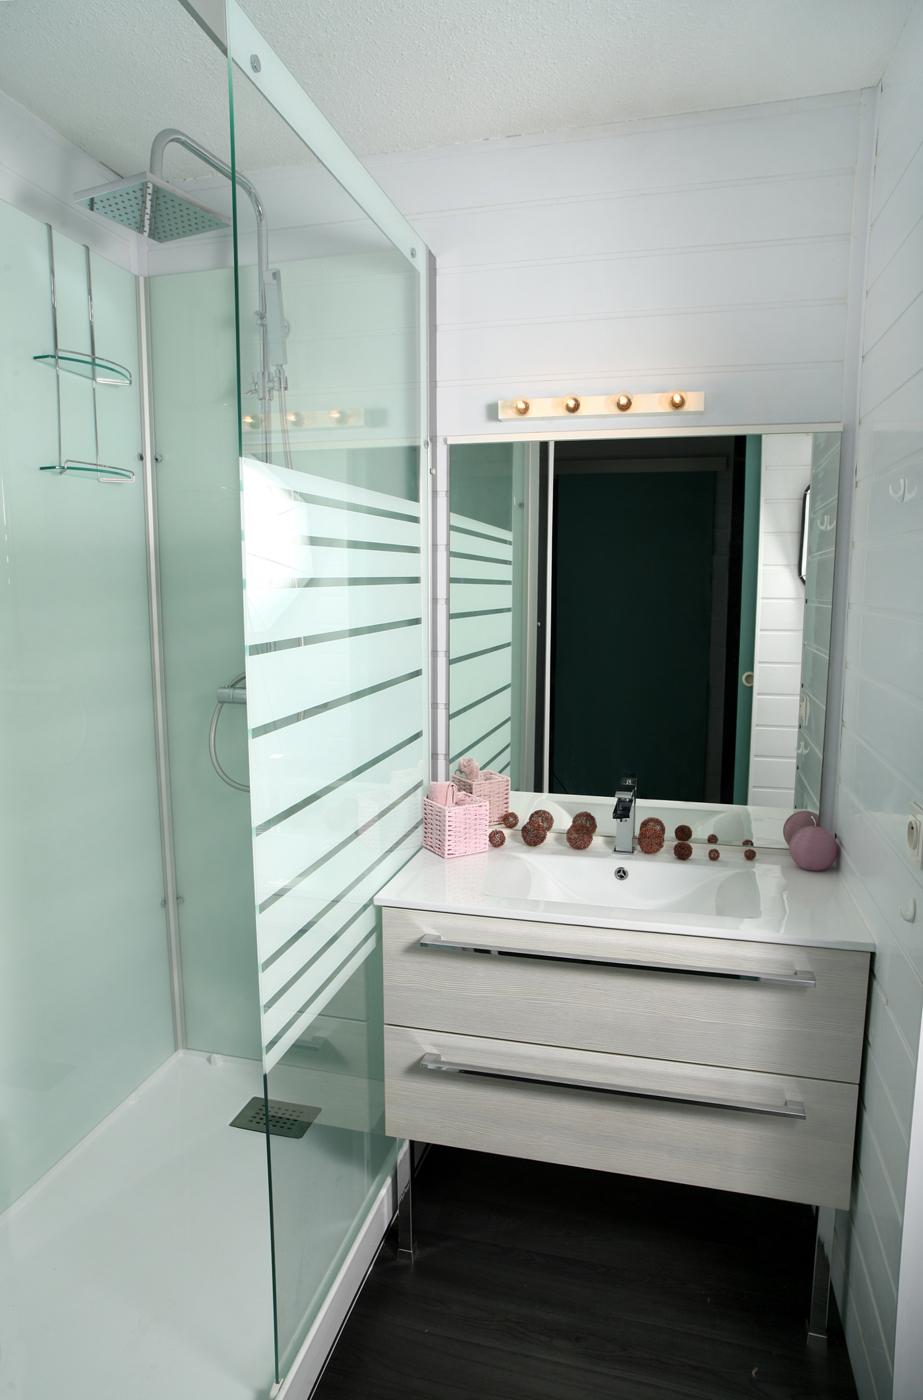 Salle De Bain Dax salle de bain t1 -